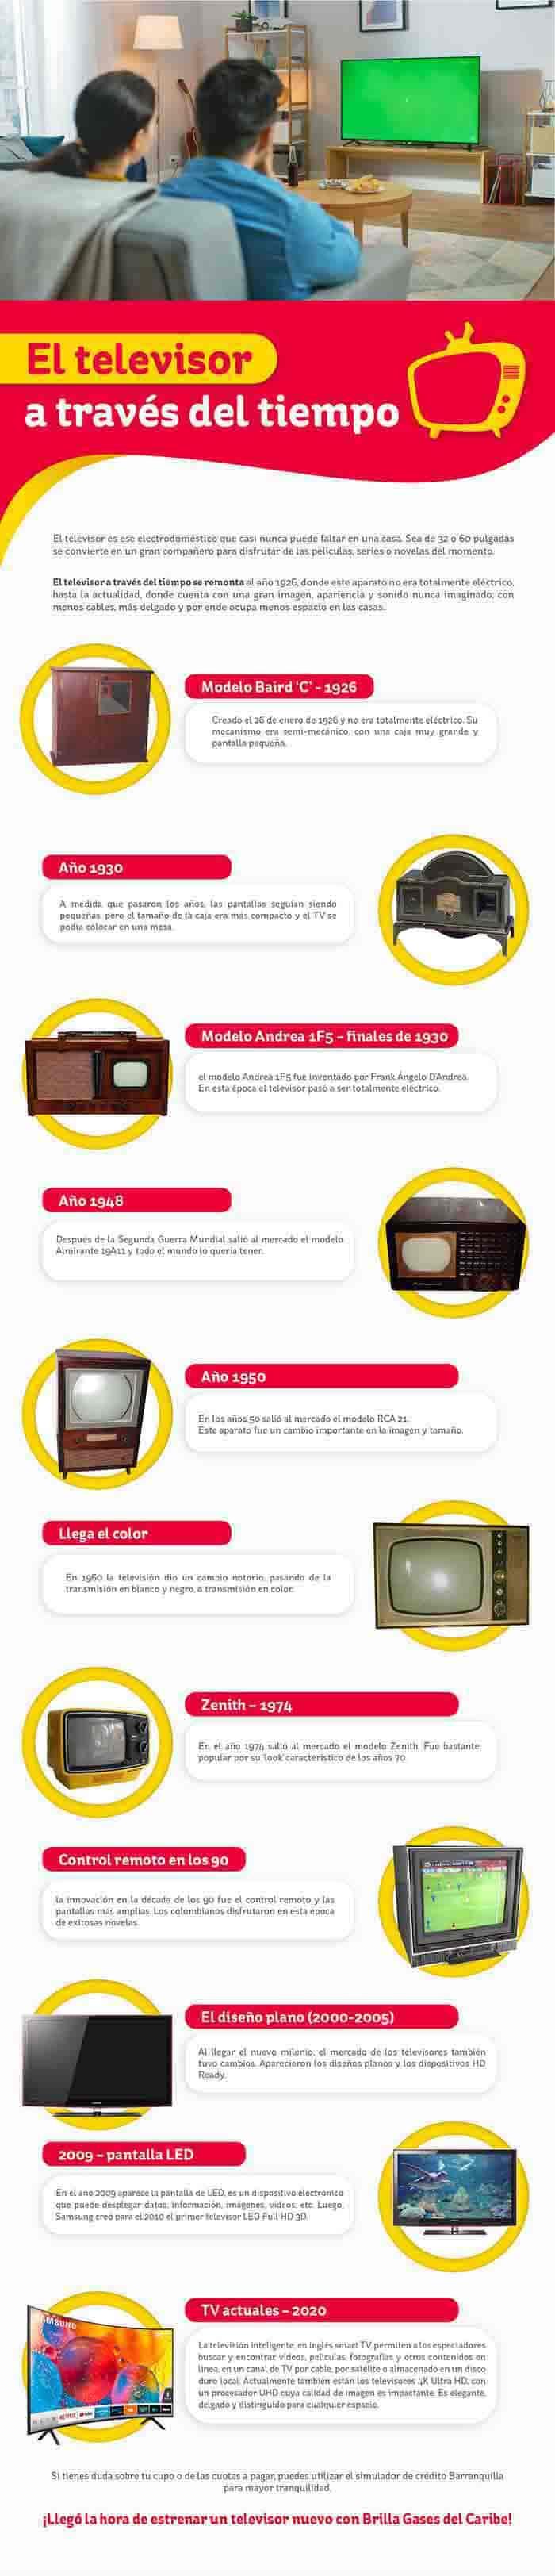 Como han evolucionado los televisores - infografia